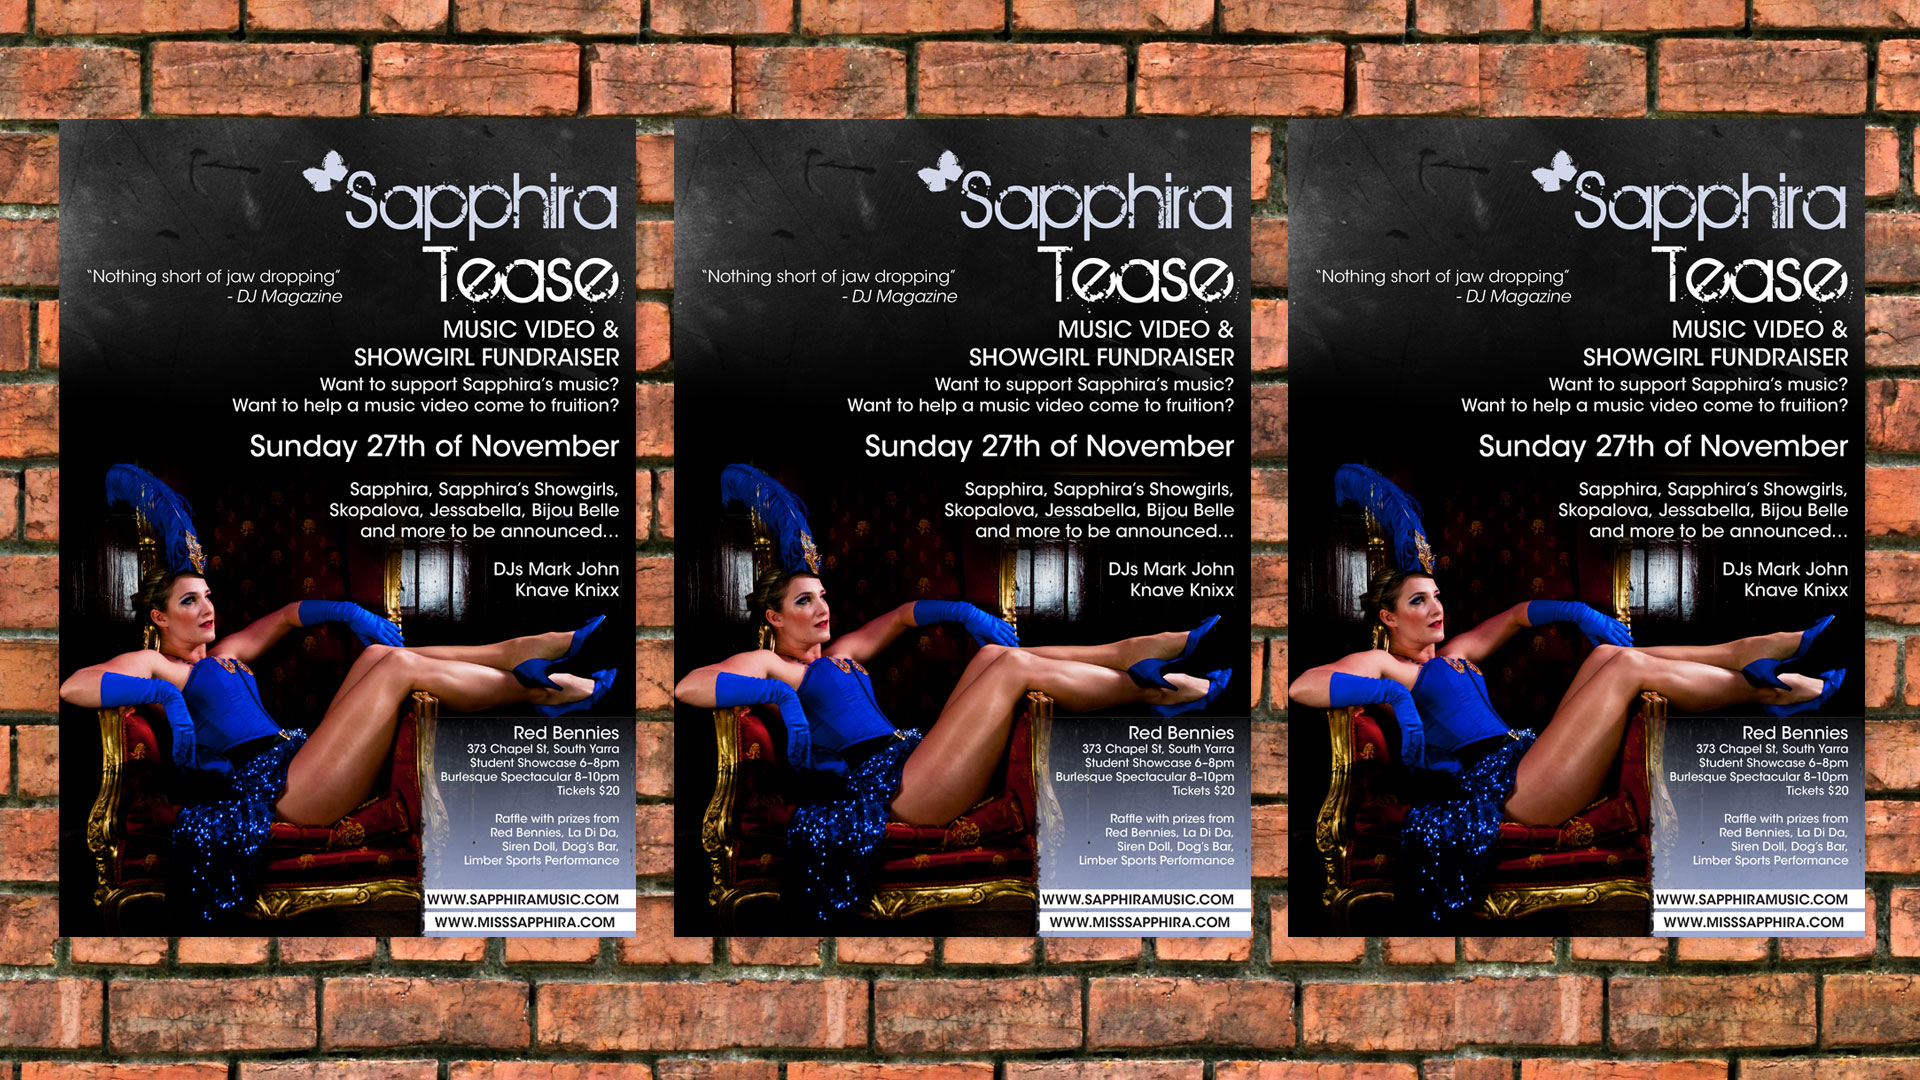 Sapphira - Tease poster